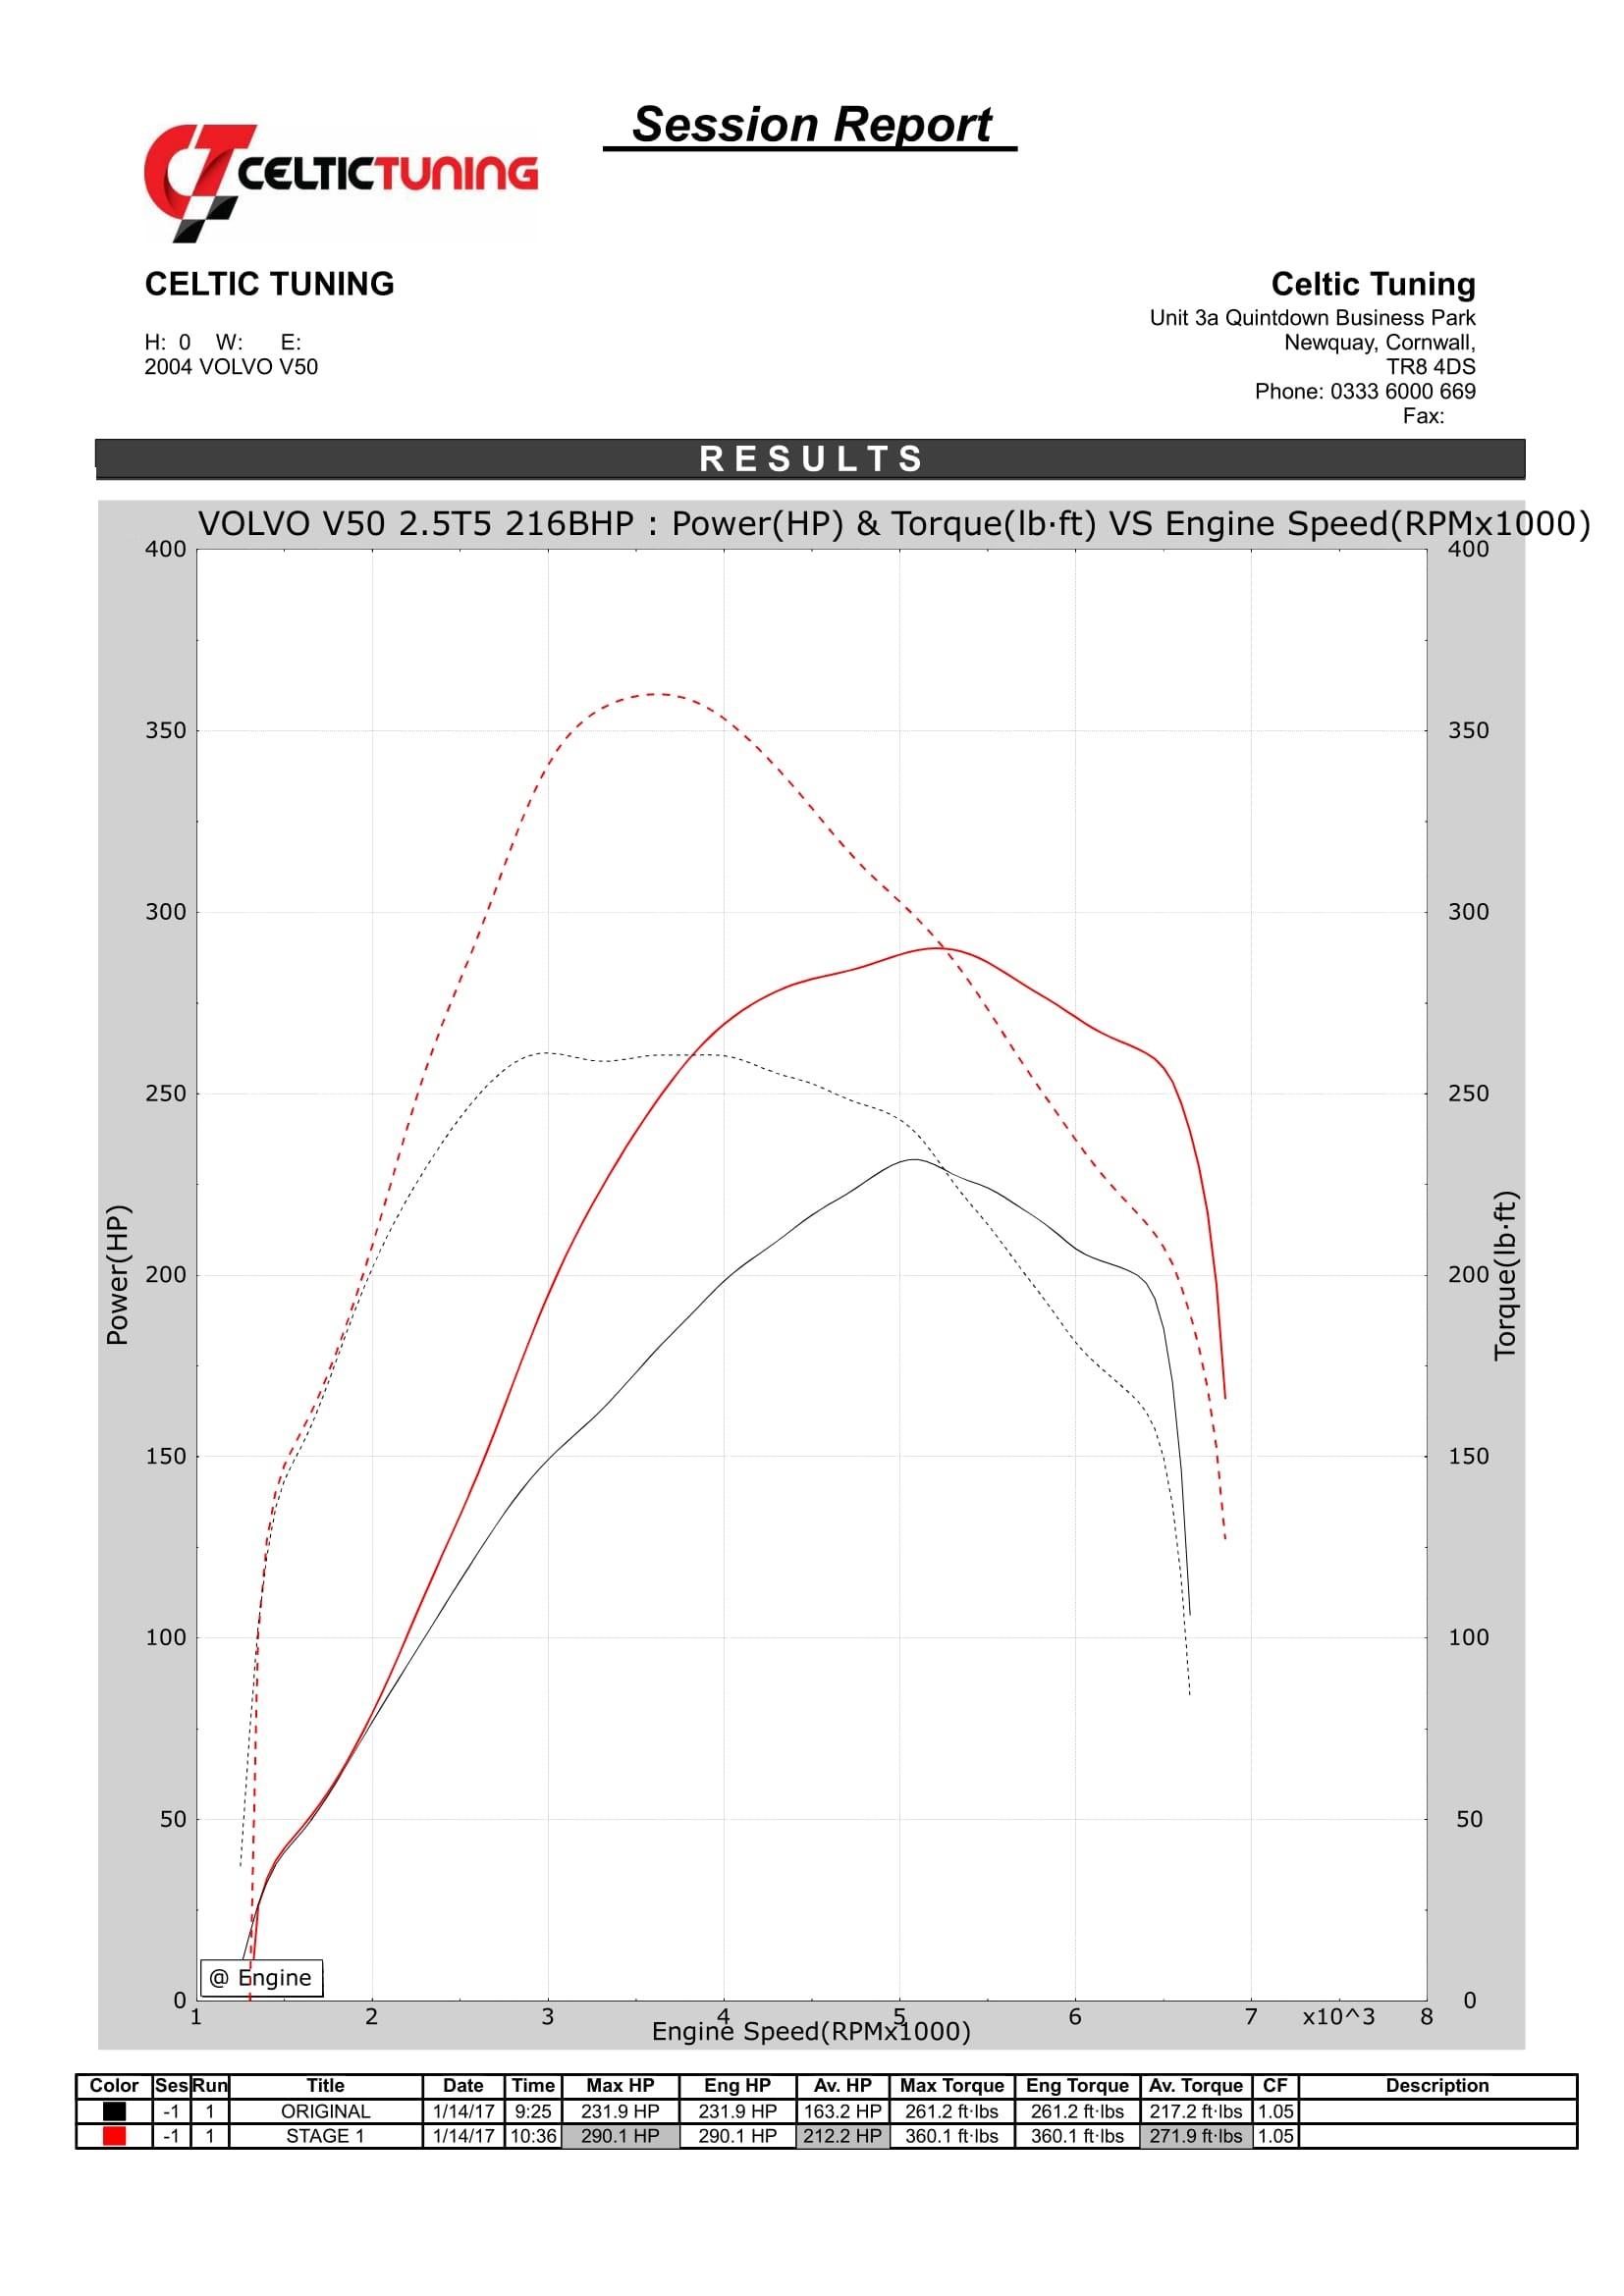 42 Torque With Stage 1 Ecu Remap On Volvo C30 2 5 T5 164 Kw